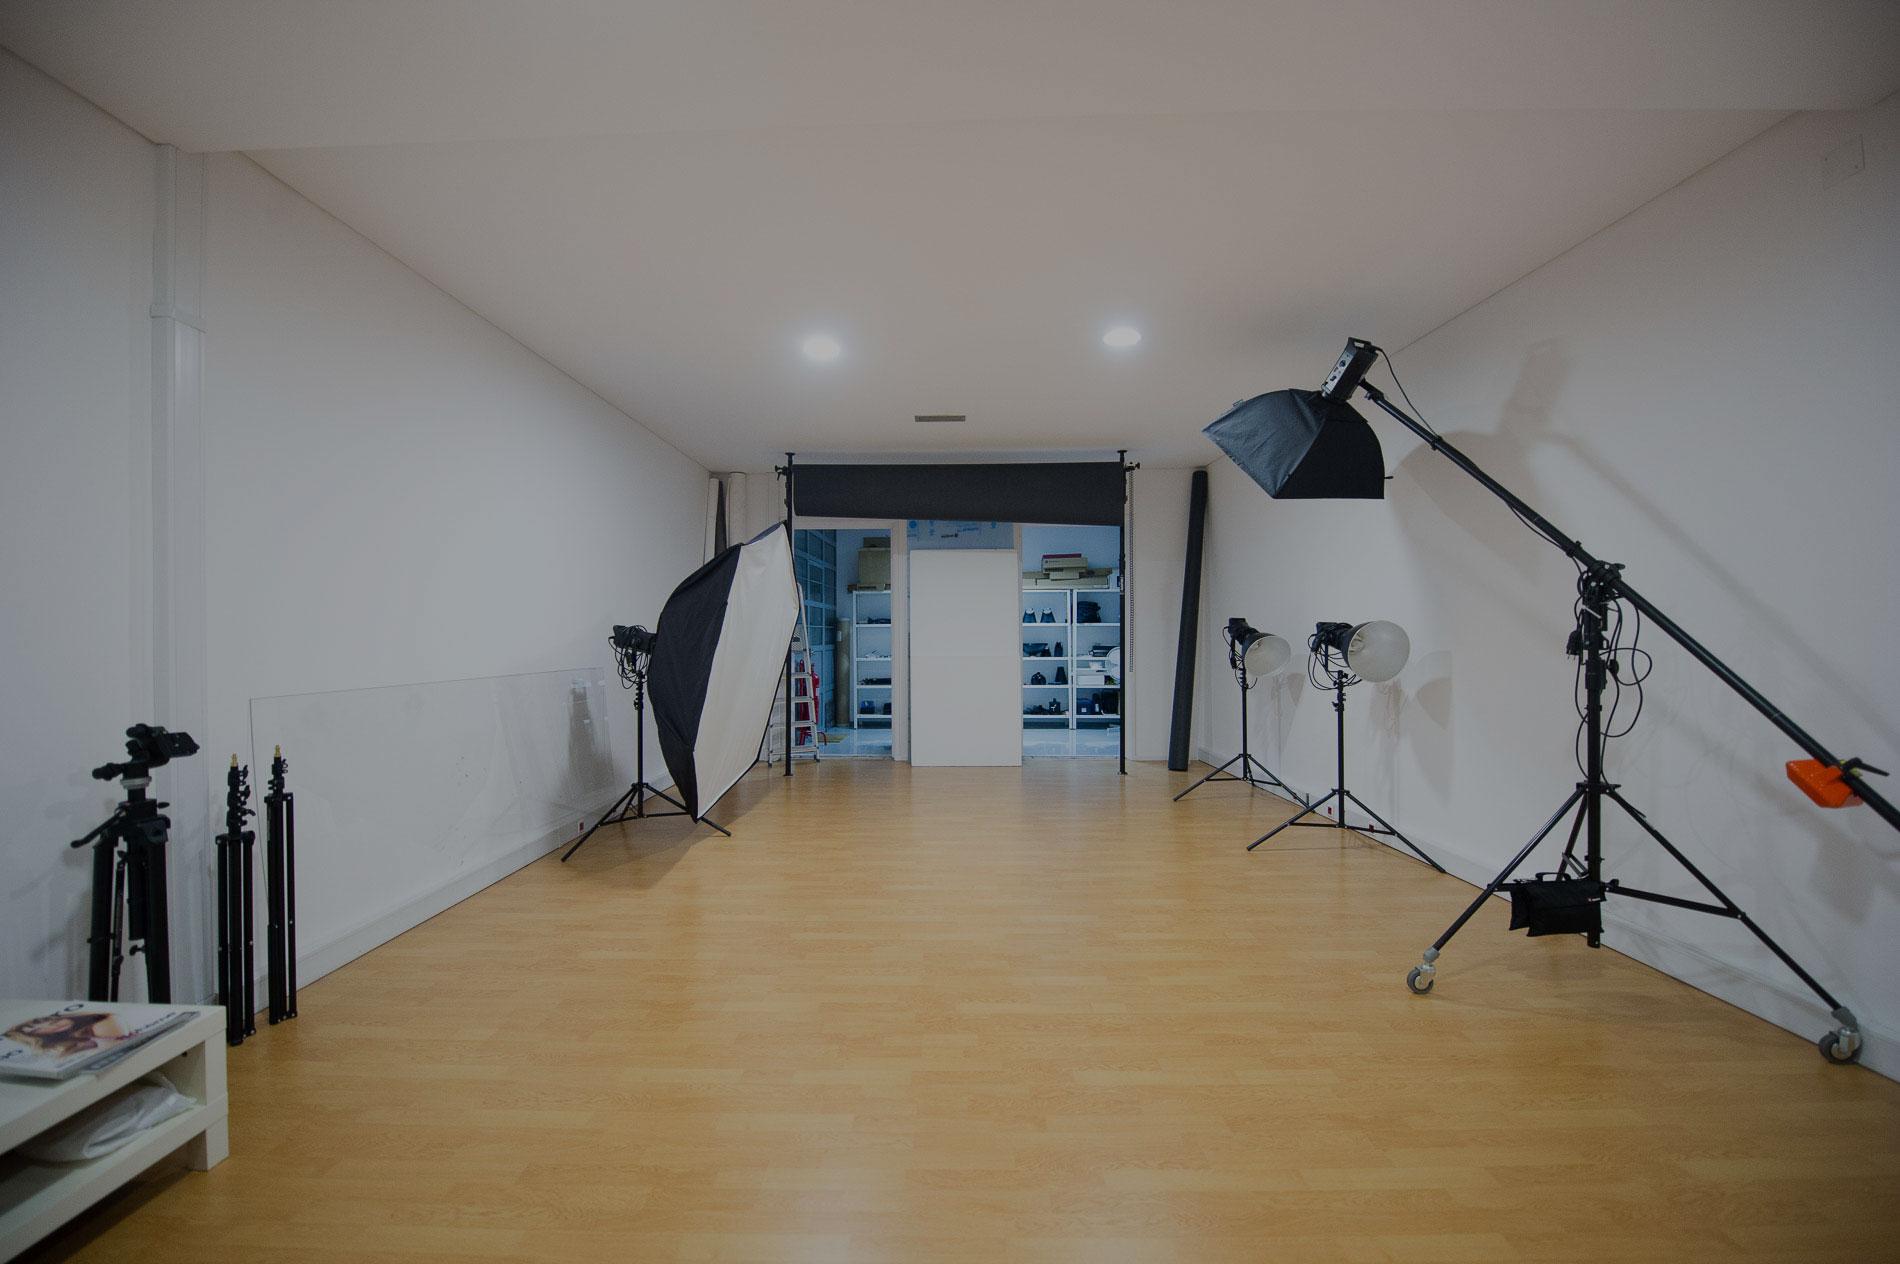 Aluguer de estúdio fotográfico <br>e workshops